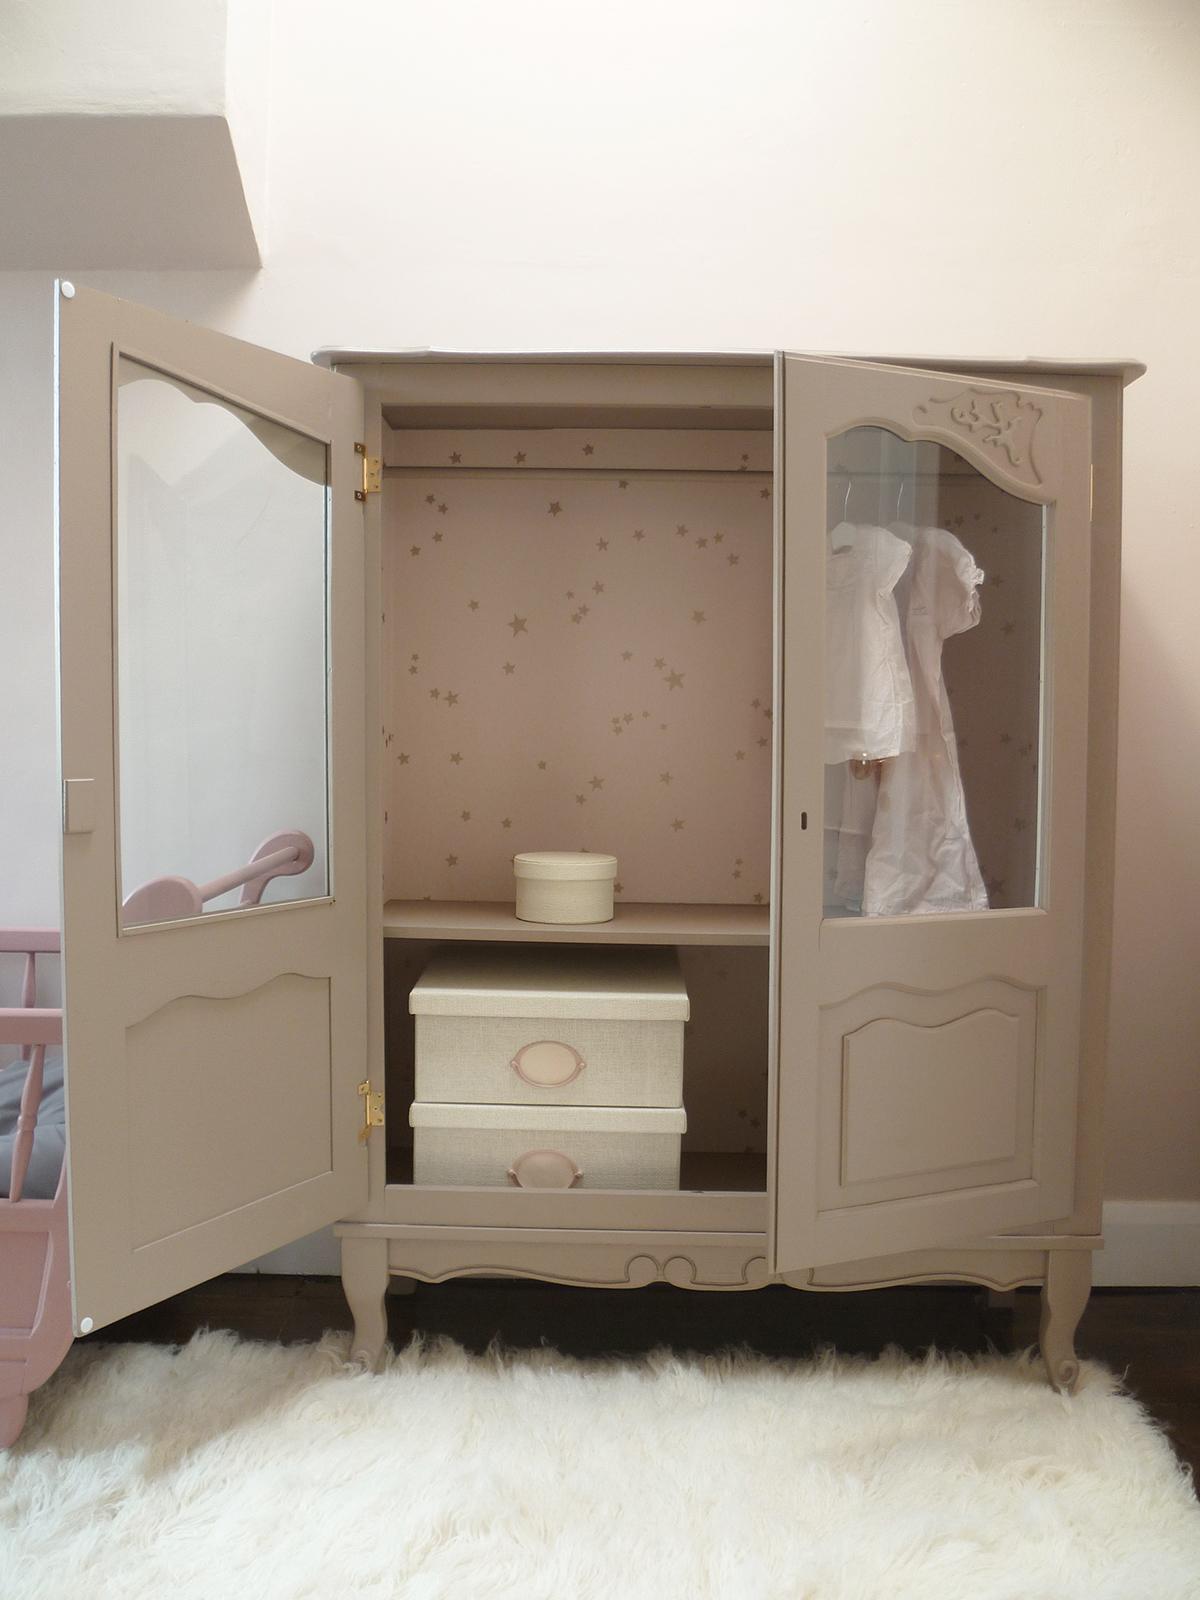 Preciously Me blog : One Room Challenge - DIY Wardrobe makeover